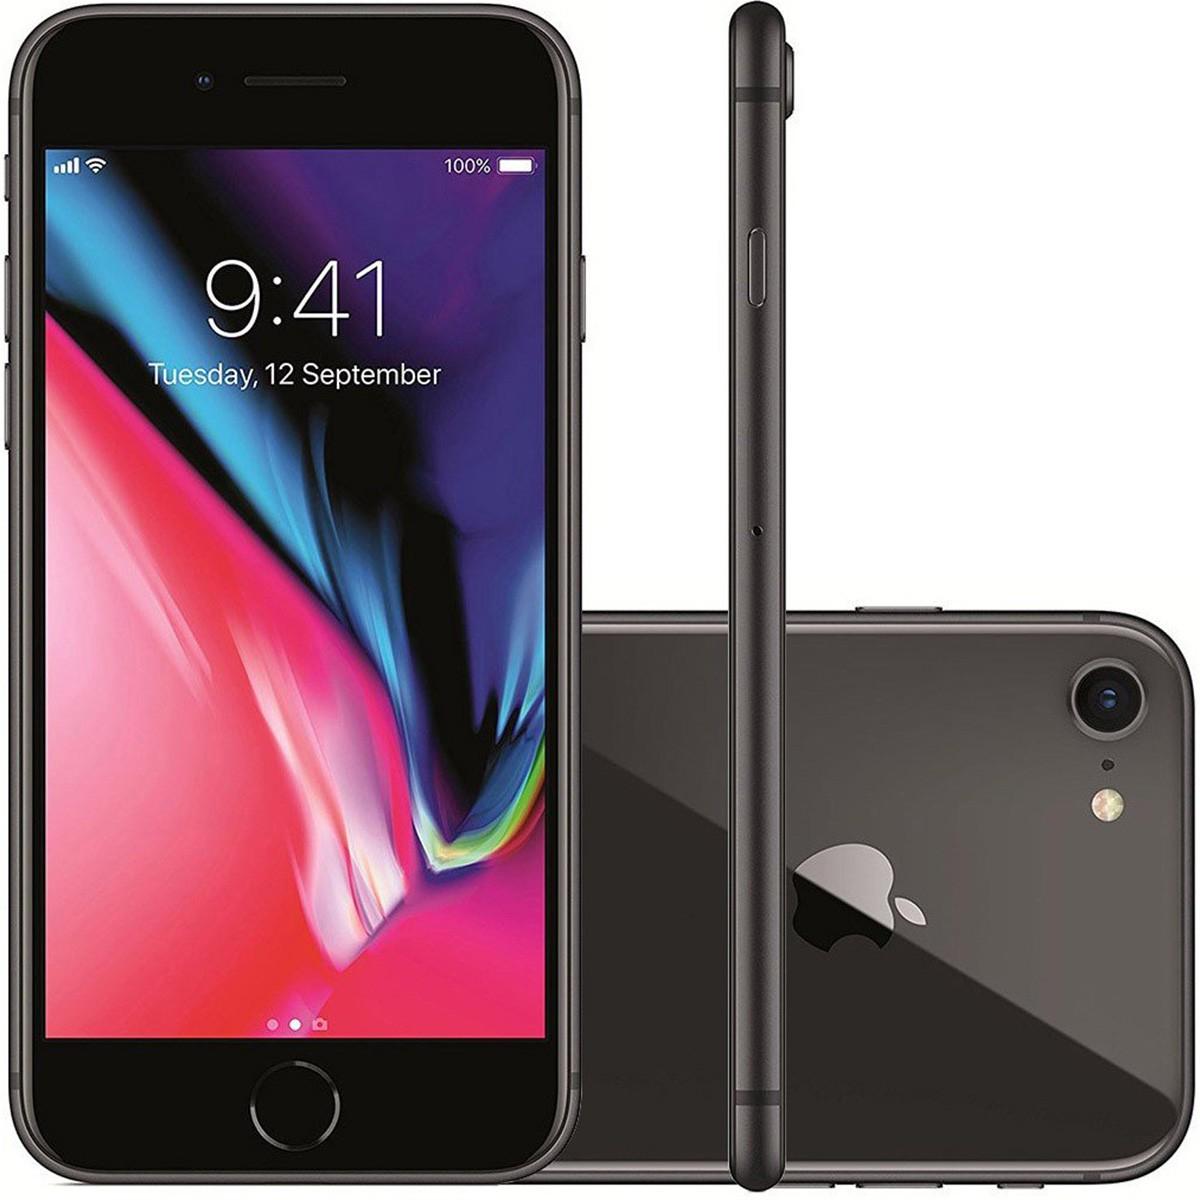 Smartphone Apple iPhone 8 256GB Tela 4,7' 12MP (Open Box)